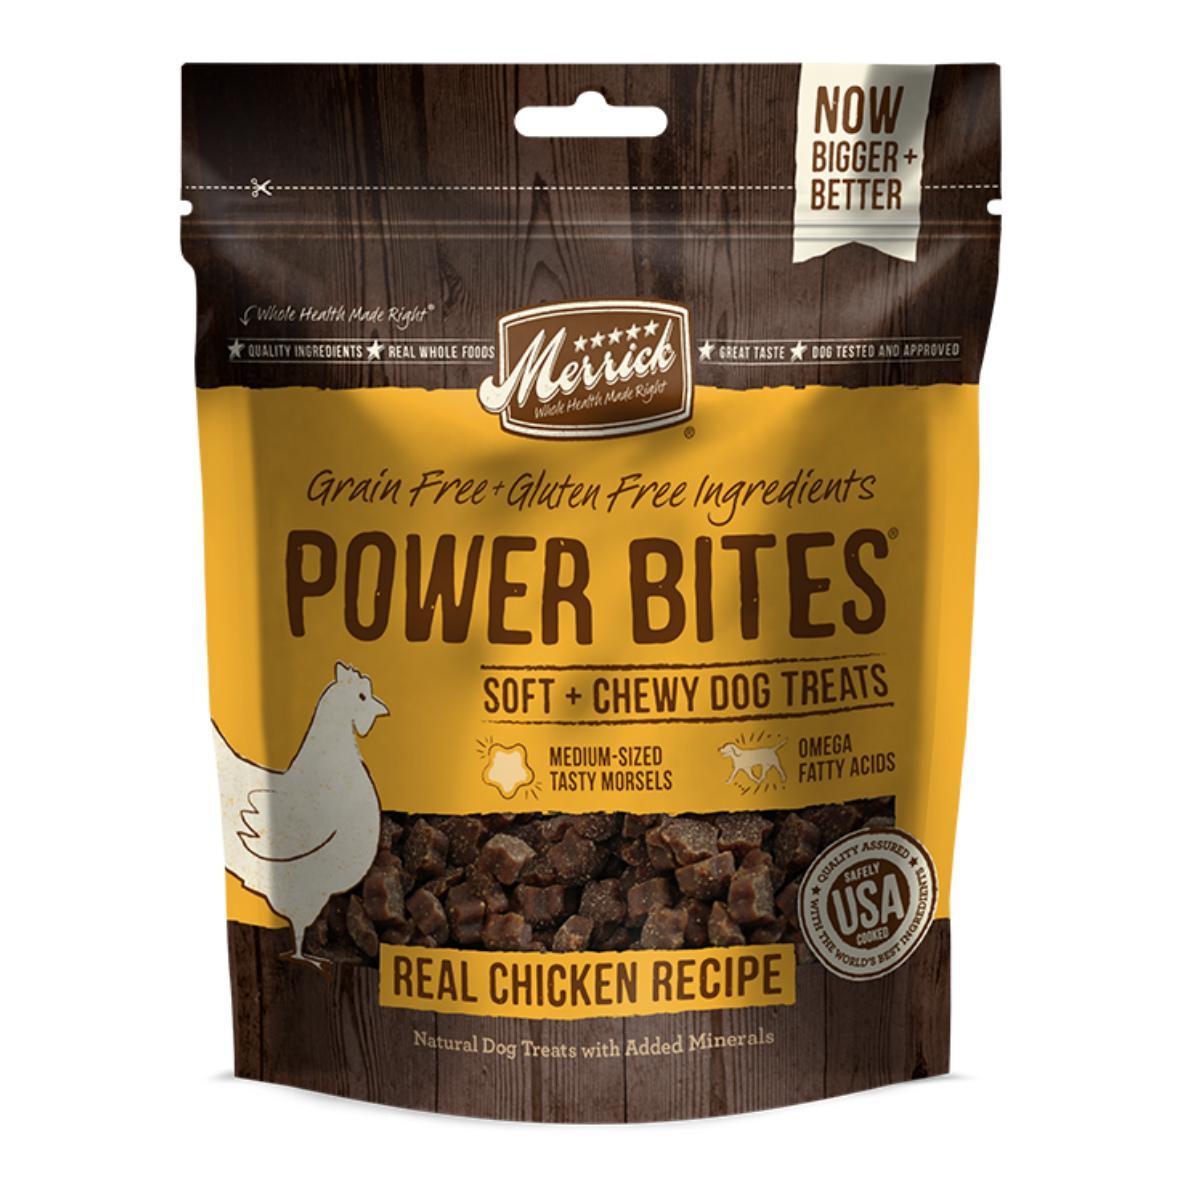 Merrick Power Bites Dog Treats - Real Chicken